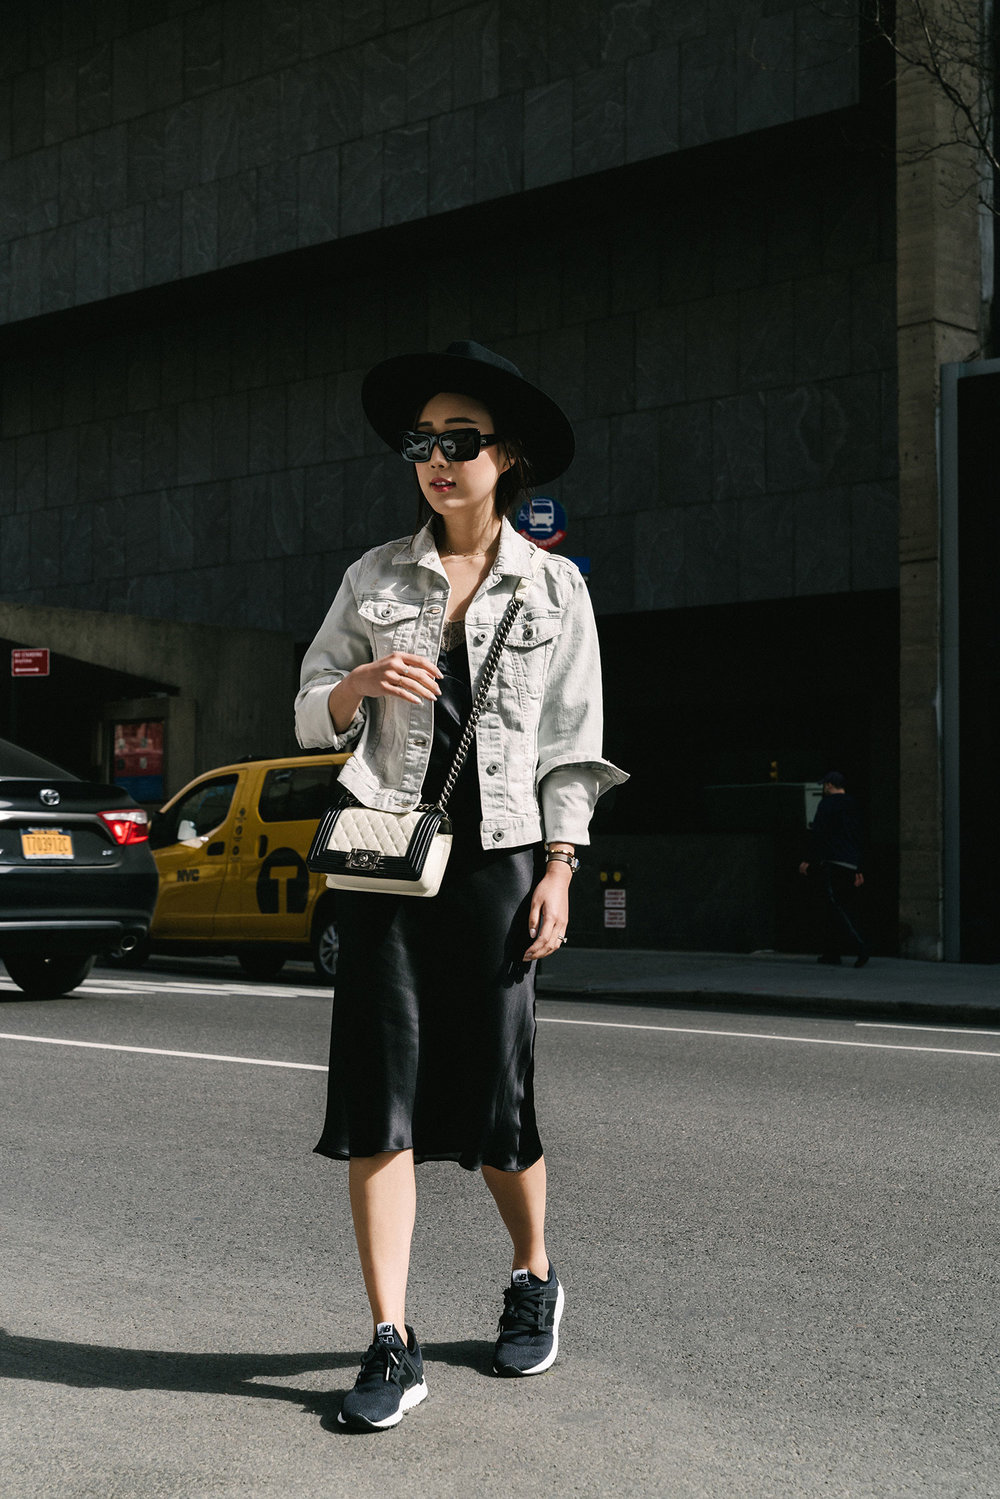 Uniqlo Jacket, Maison Margiela Dress, New Balance Sneakers, Chanel Bag, Chloé Sunglasses, Janessa Leone Hat